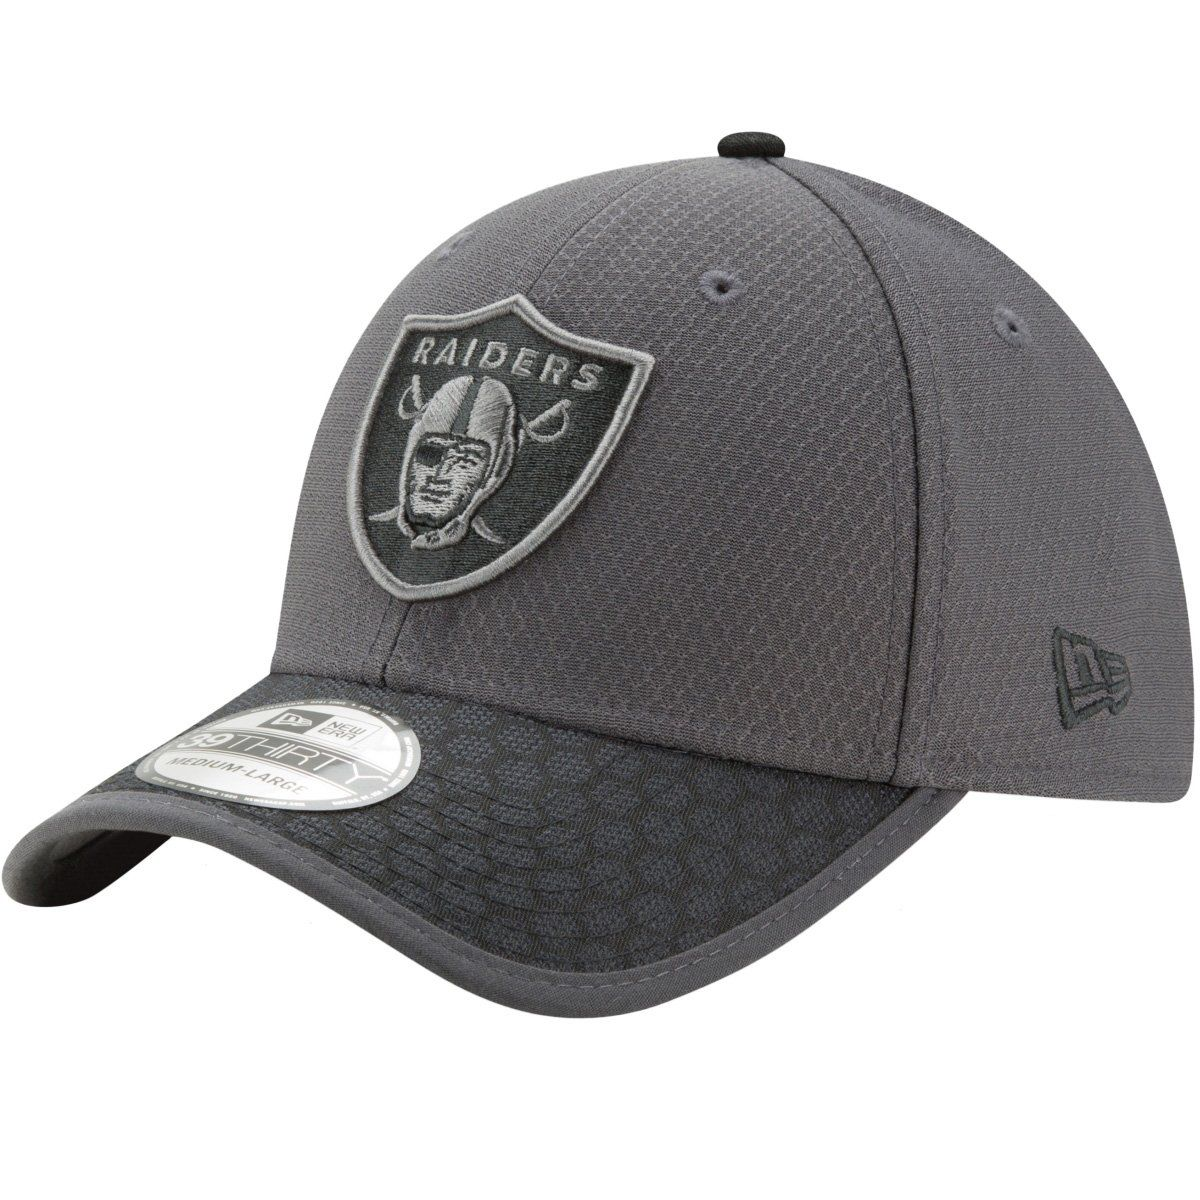 amfoo - New Era 39Thirty Cap - NFL 2017 SIDELINE Oakland Raiders